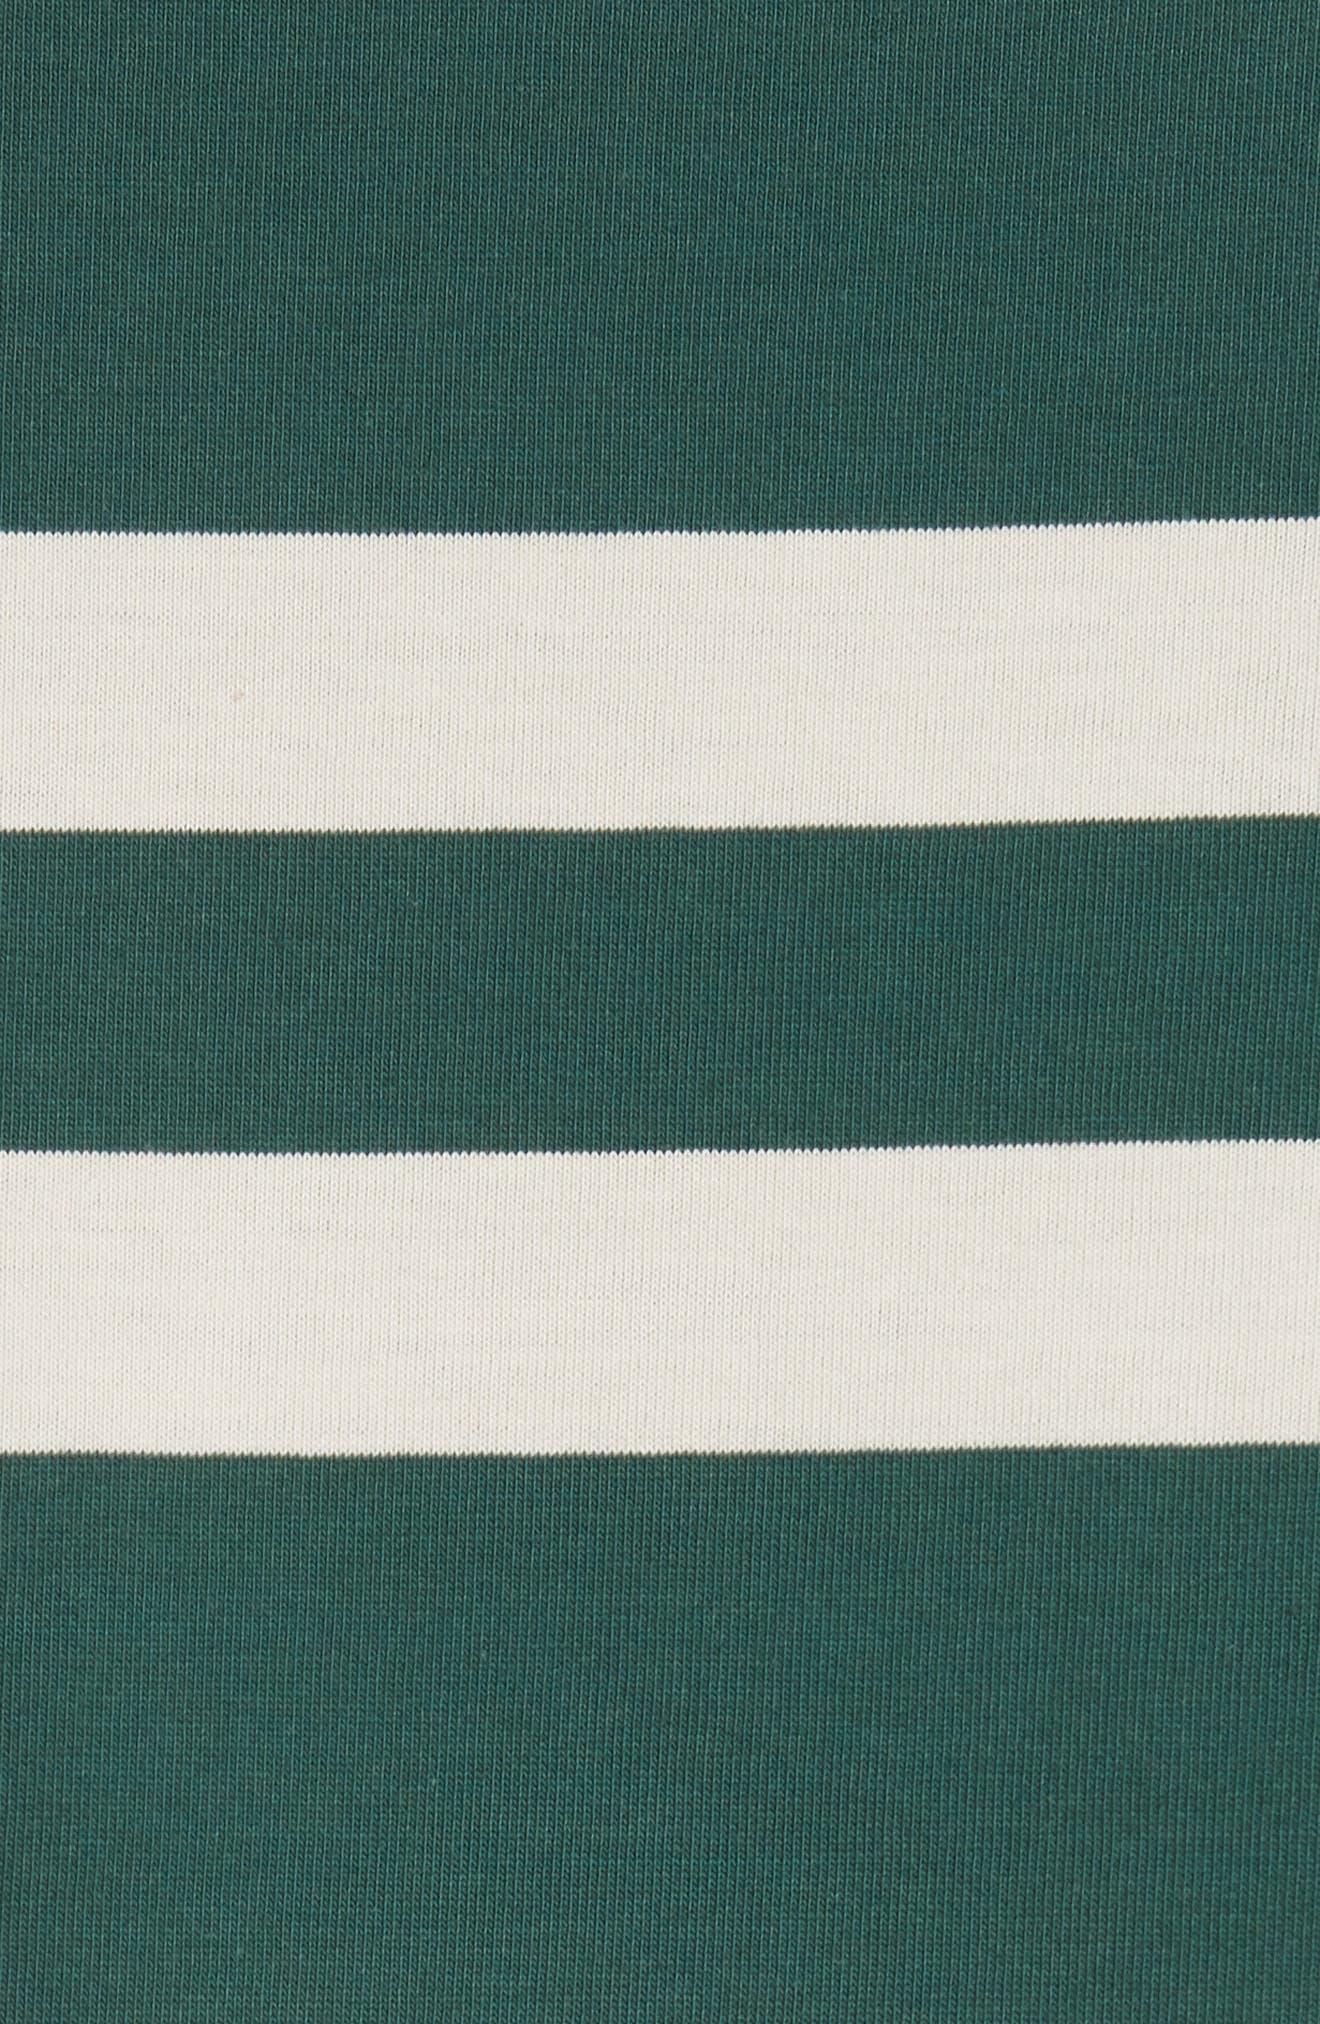 Crawley Stripe T-Shirt,                             Alternate thumbnail 5, color,                             OFF WHITE/ PINE GREEN